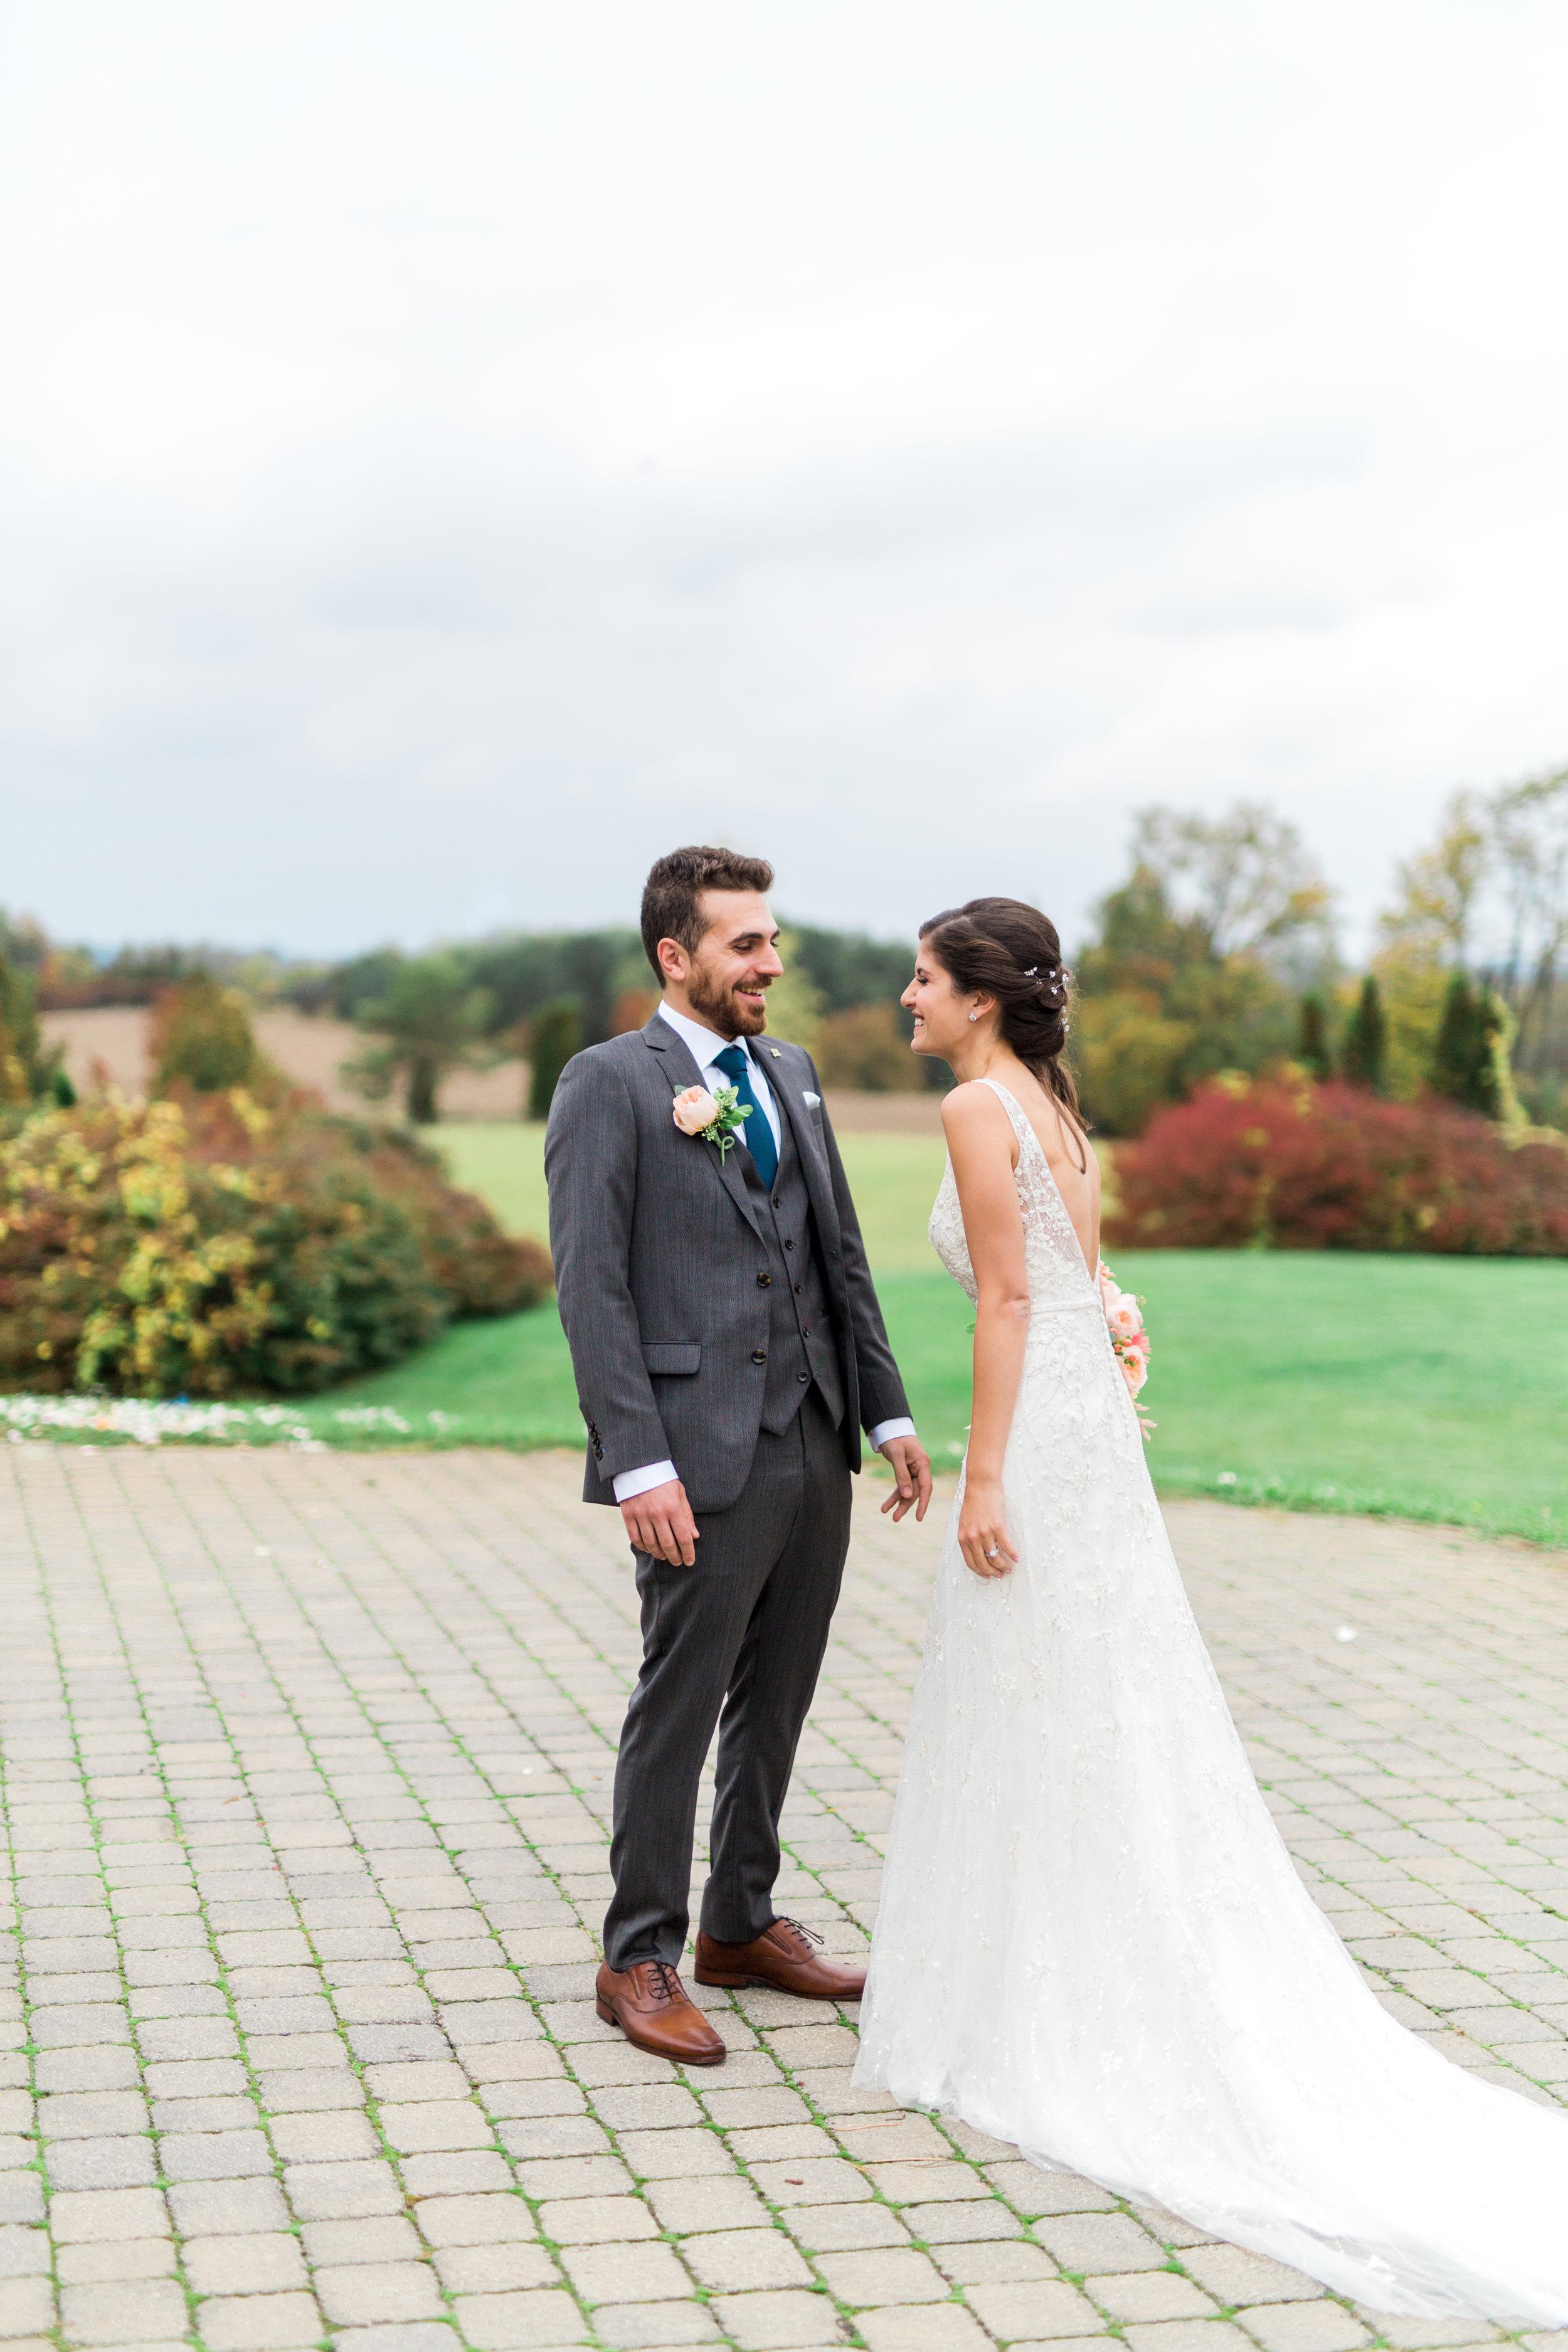 Amir-Golbazi-Danielle-Giroux-Photography_Toronto-Wedding_Cedarwood_Rachel-Paul_242.jpg